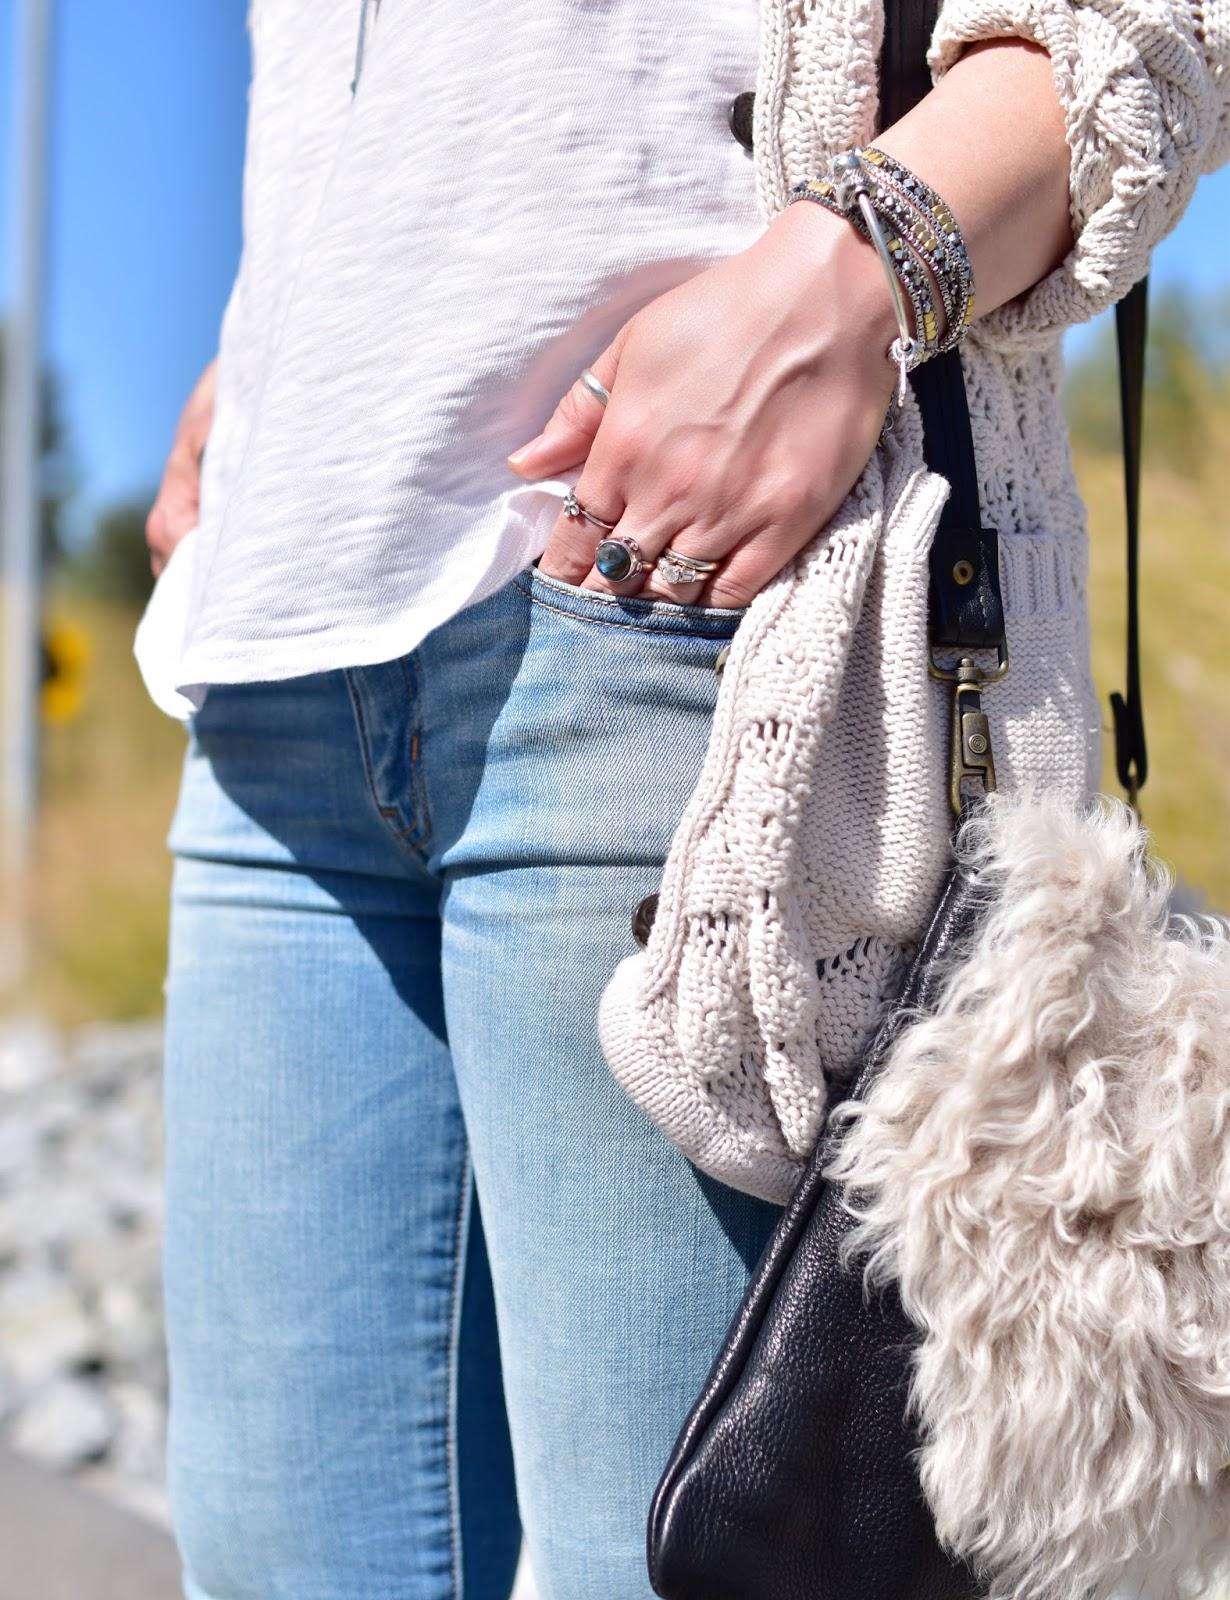 slouchy v-neck tee, skinny jeans, grandpa cardigan, sherpa bag